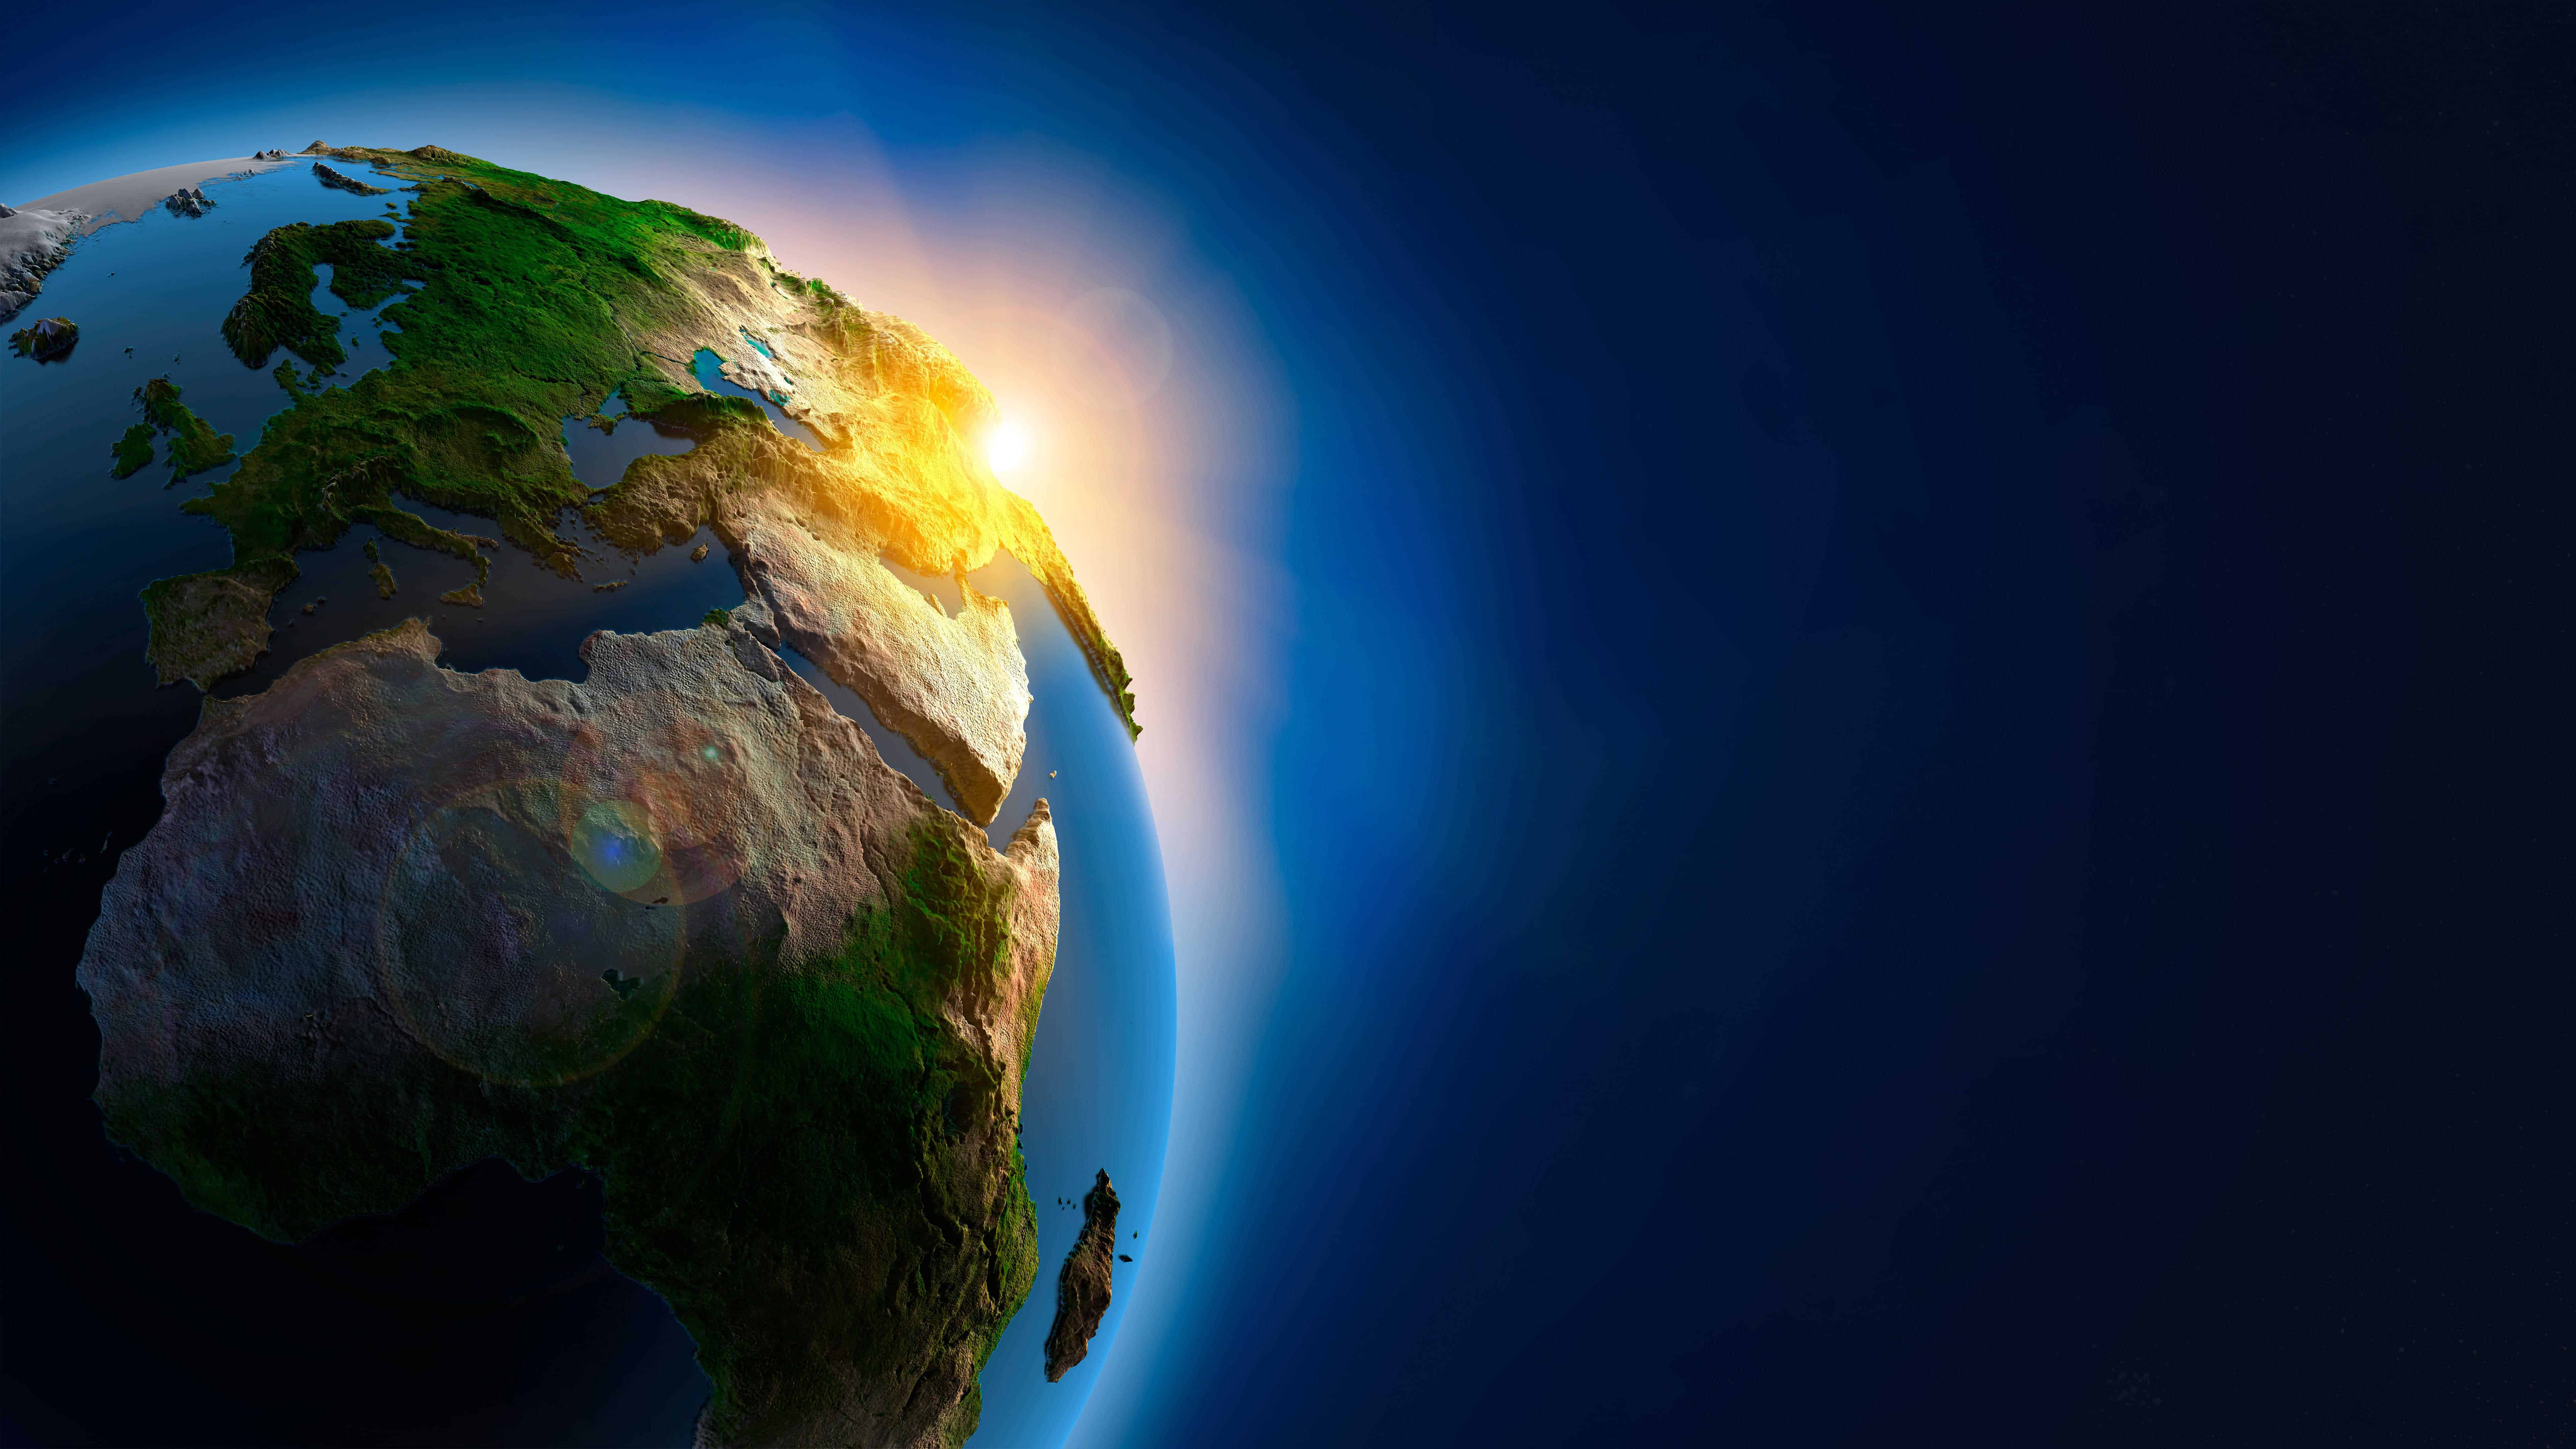 Earth 3D From Space UHD 8K Wallpaper Pixelz 7680x4320